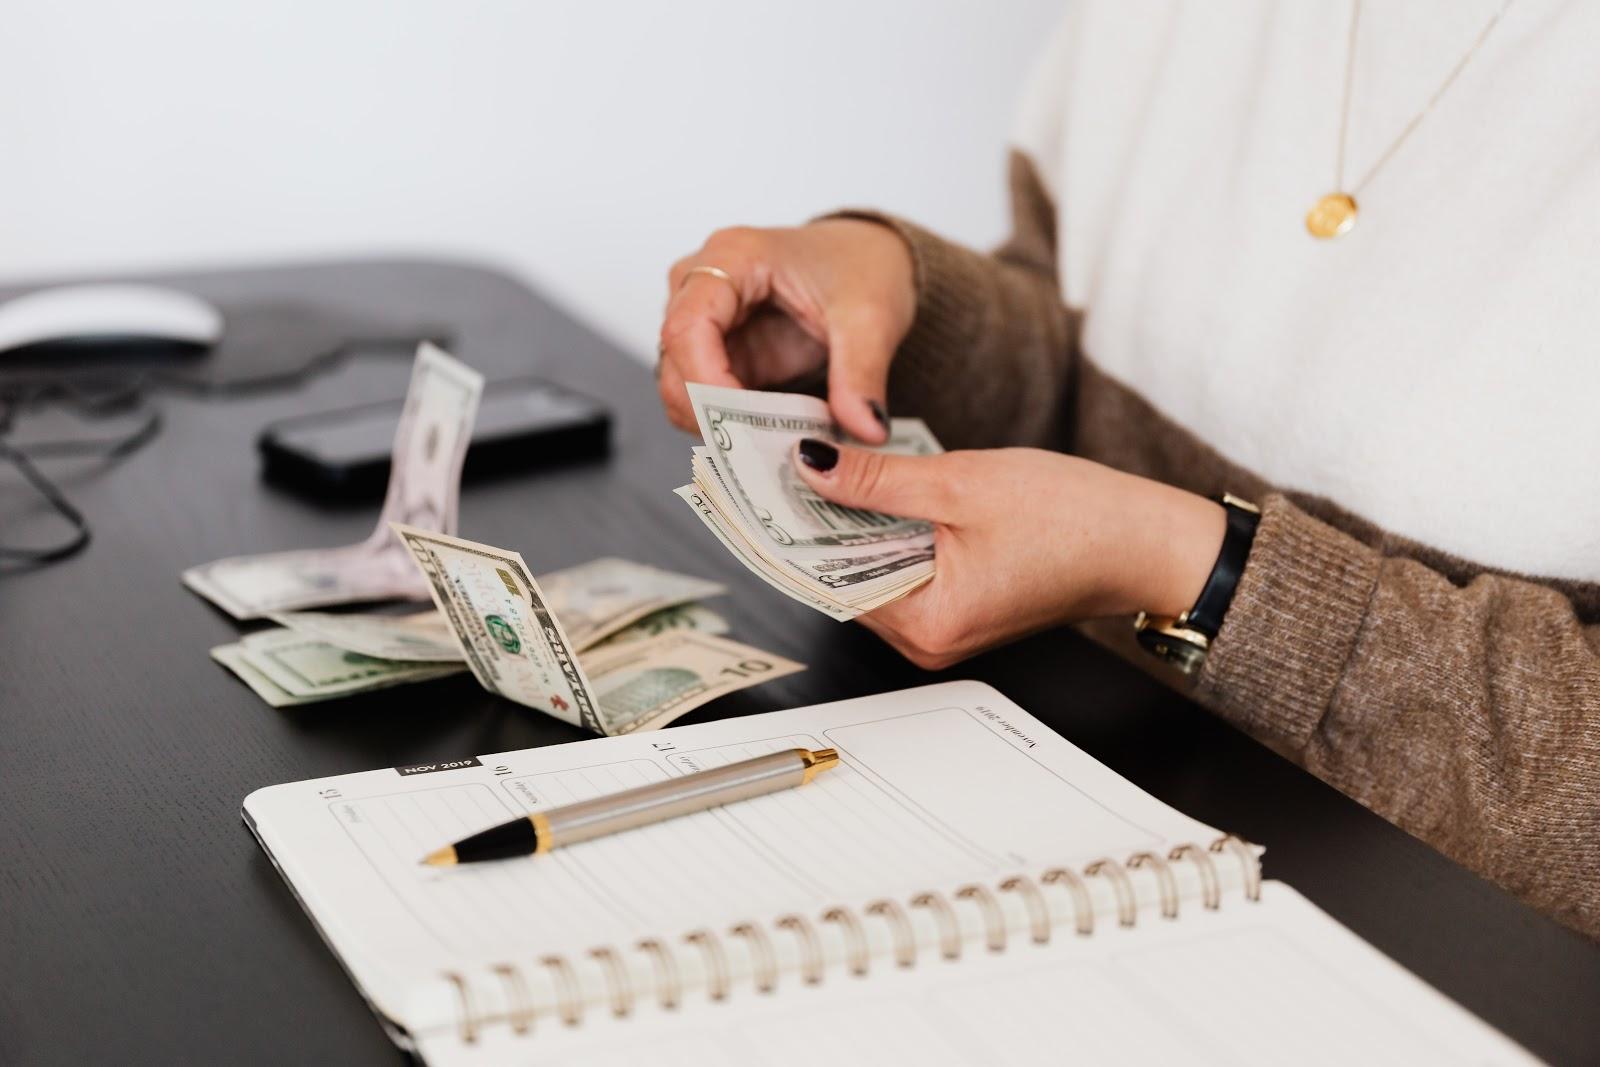 basic skills of budgeting